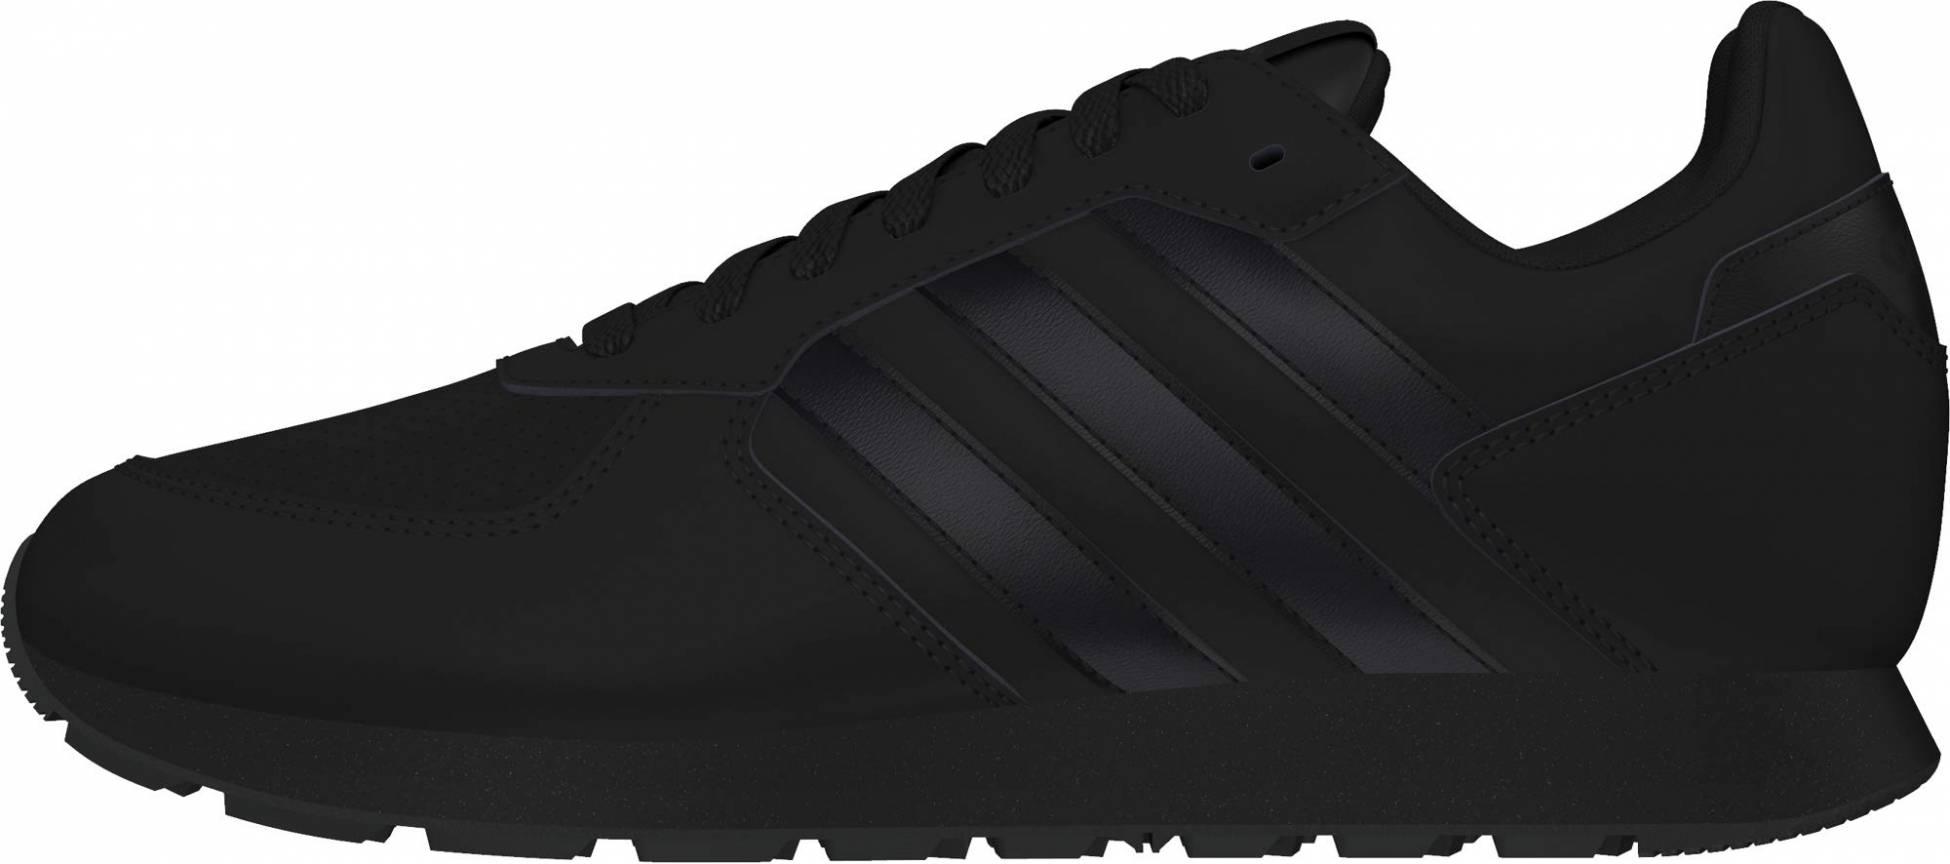 Adidas 8K sneakers in grey (only $59)   RunRepeat